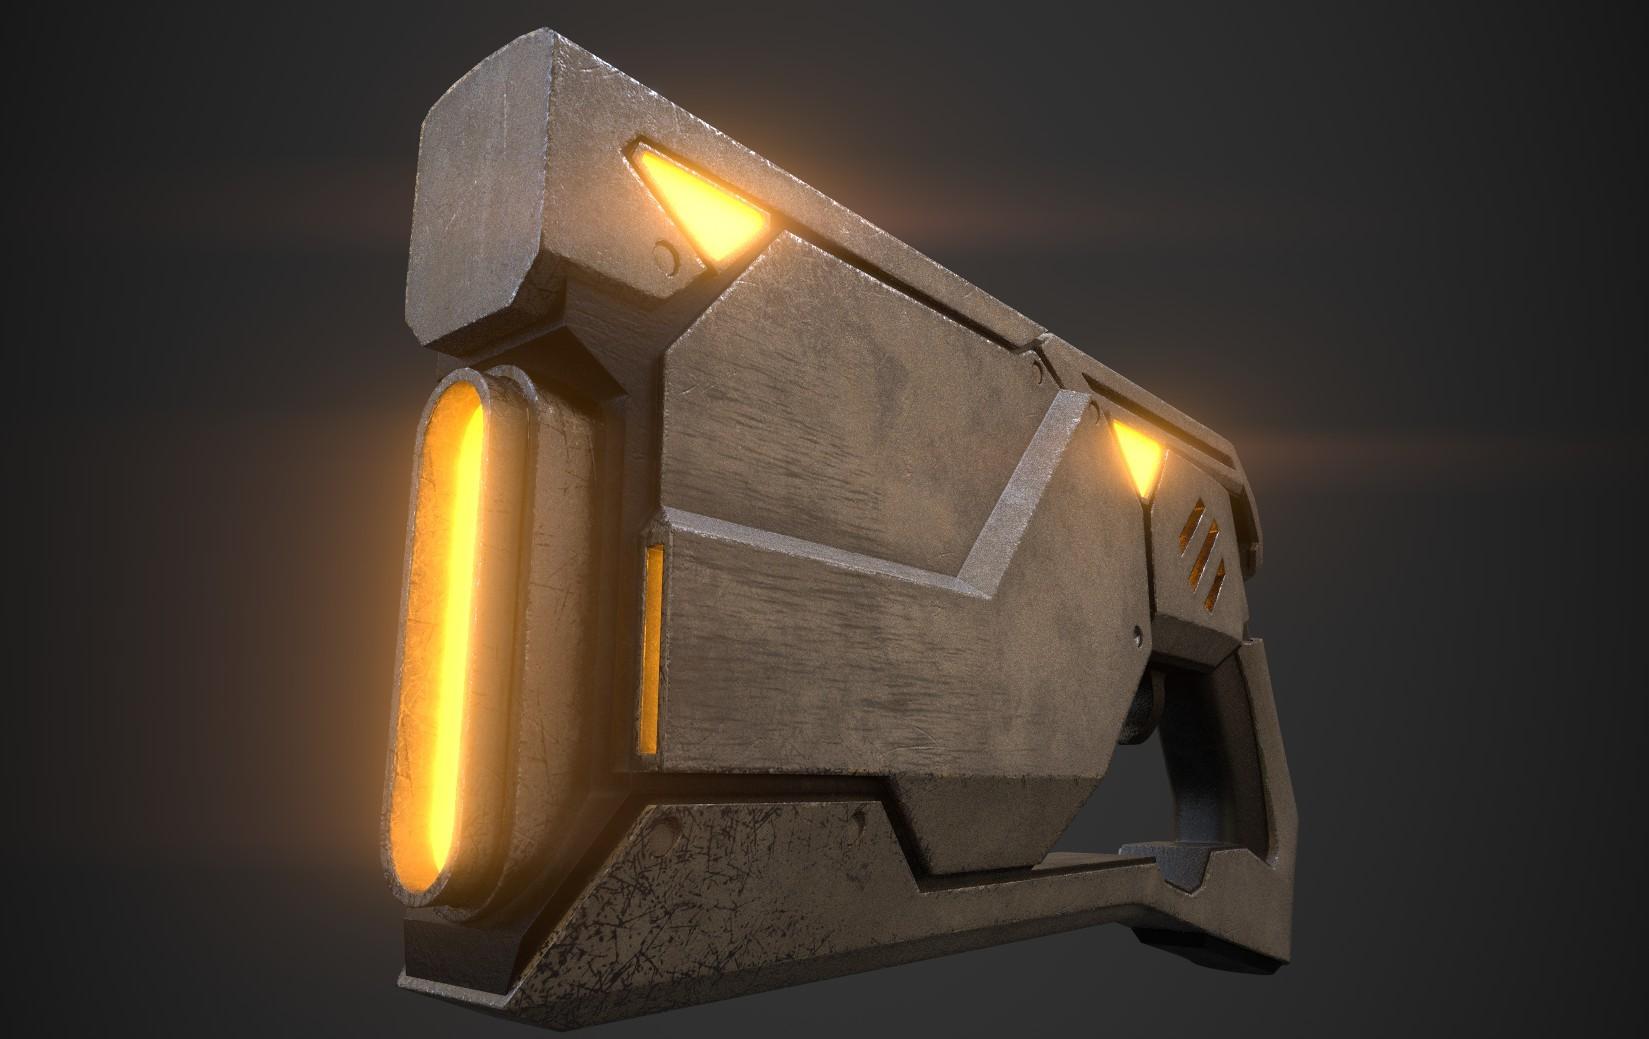 Kevin gillis nagy gun concept new 04